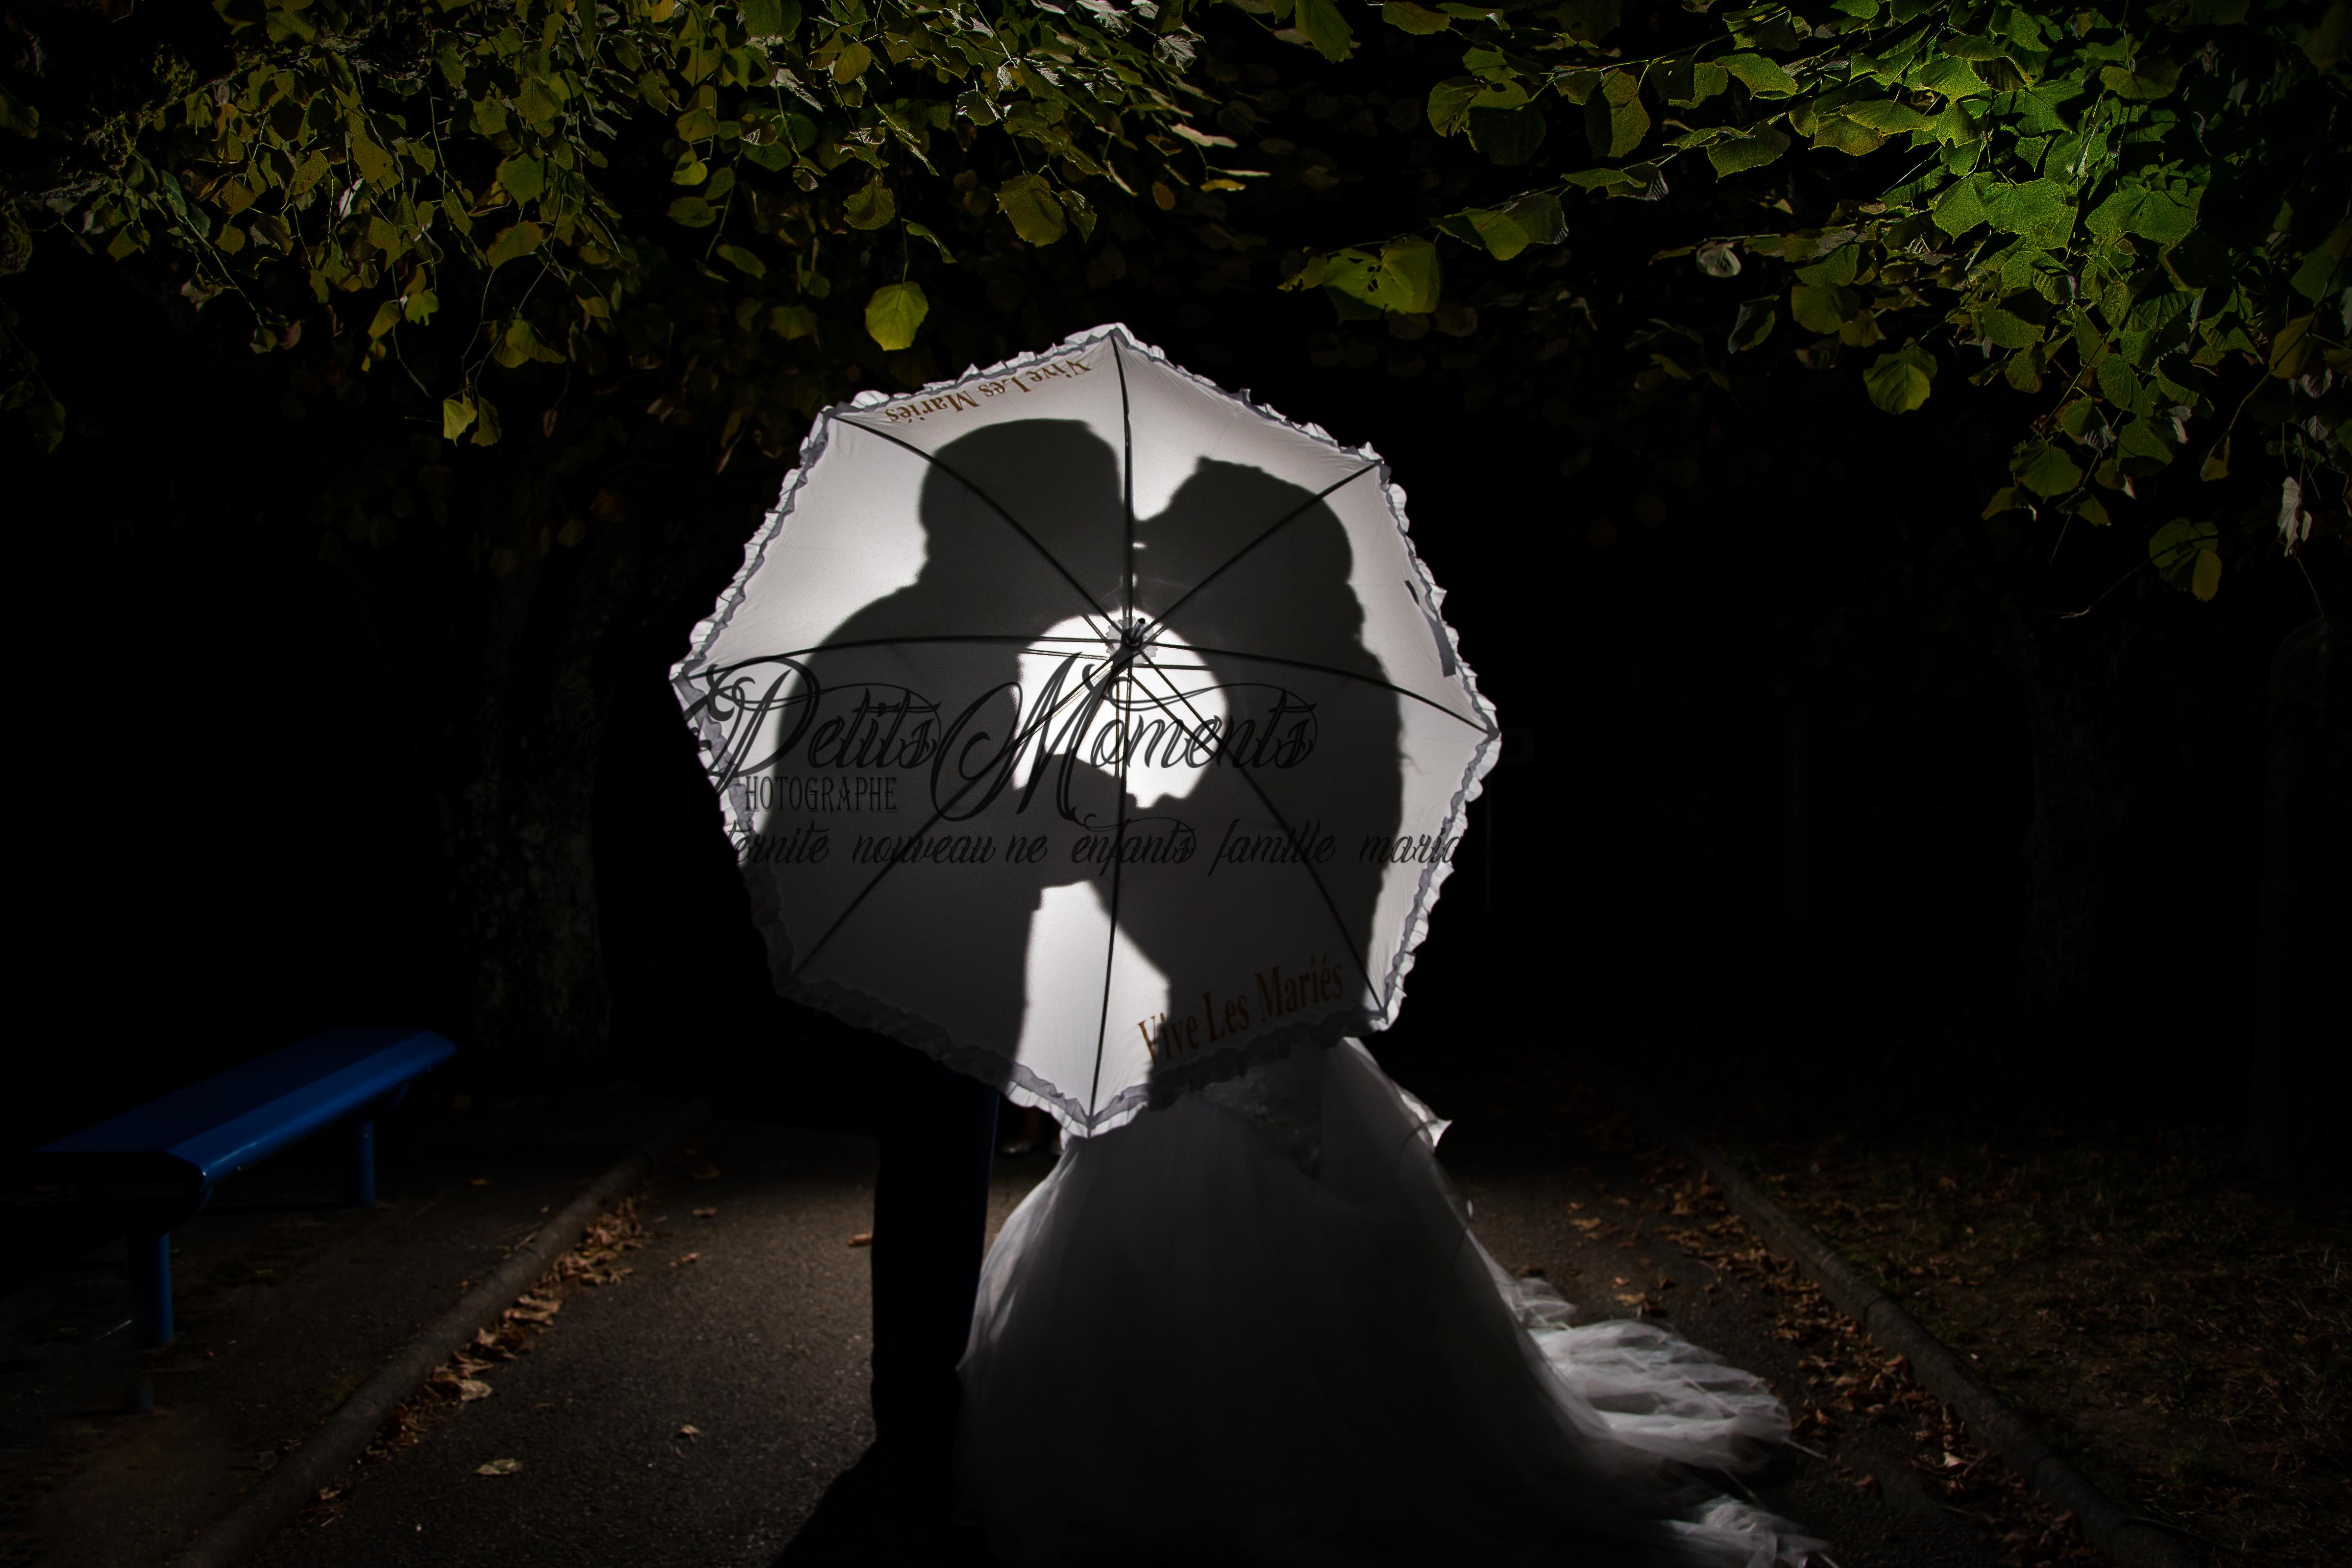 Photographevosges | Photographe les